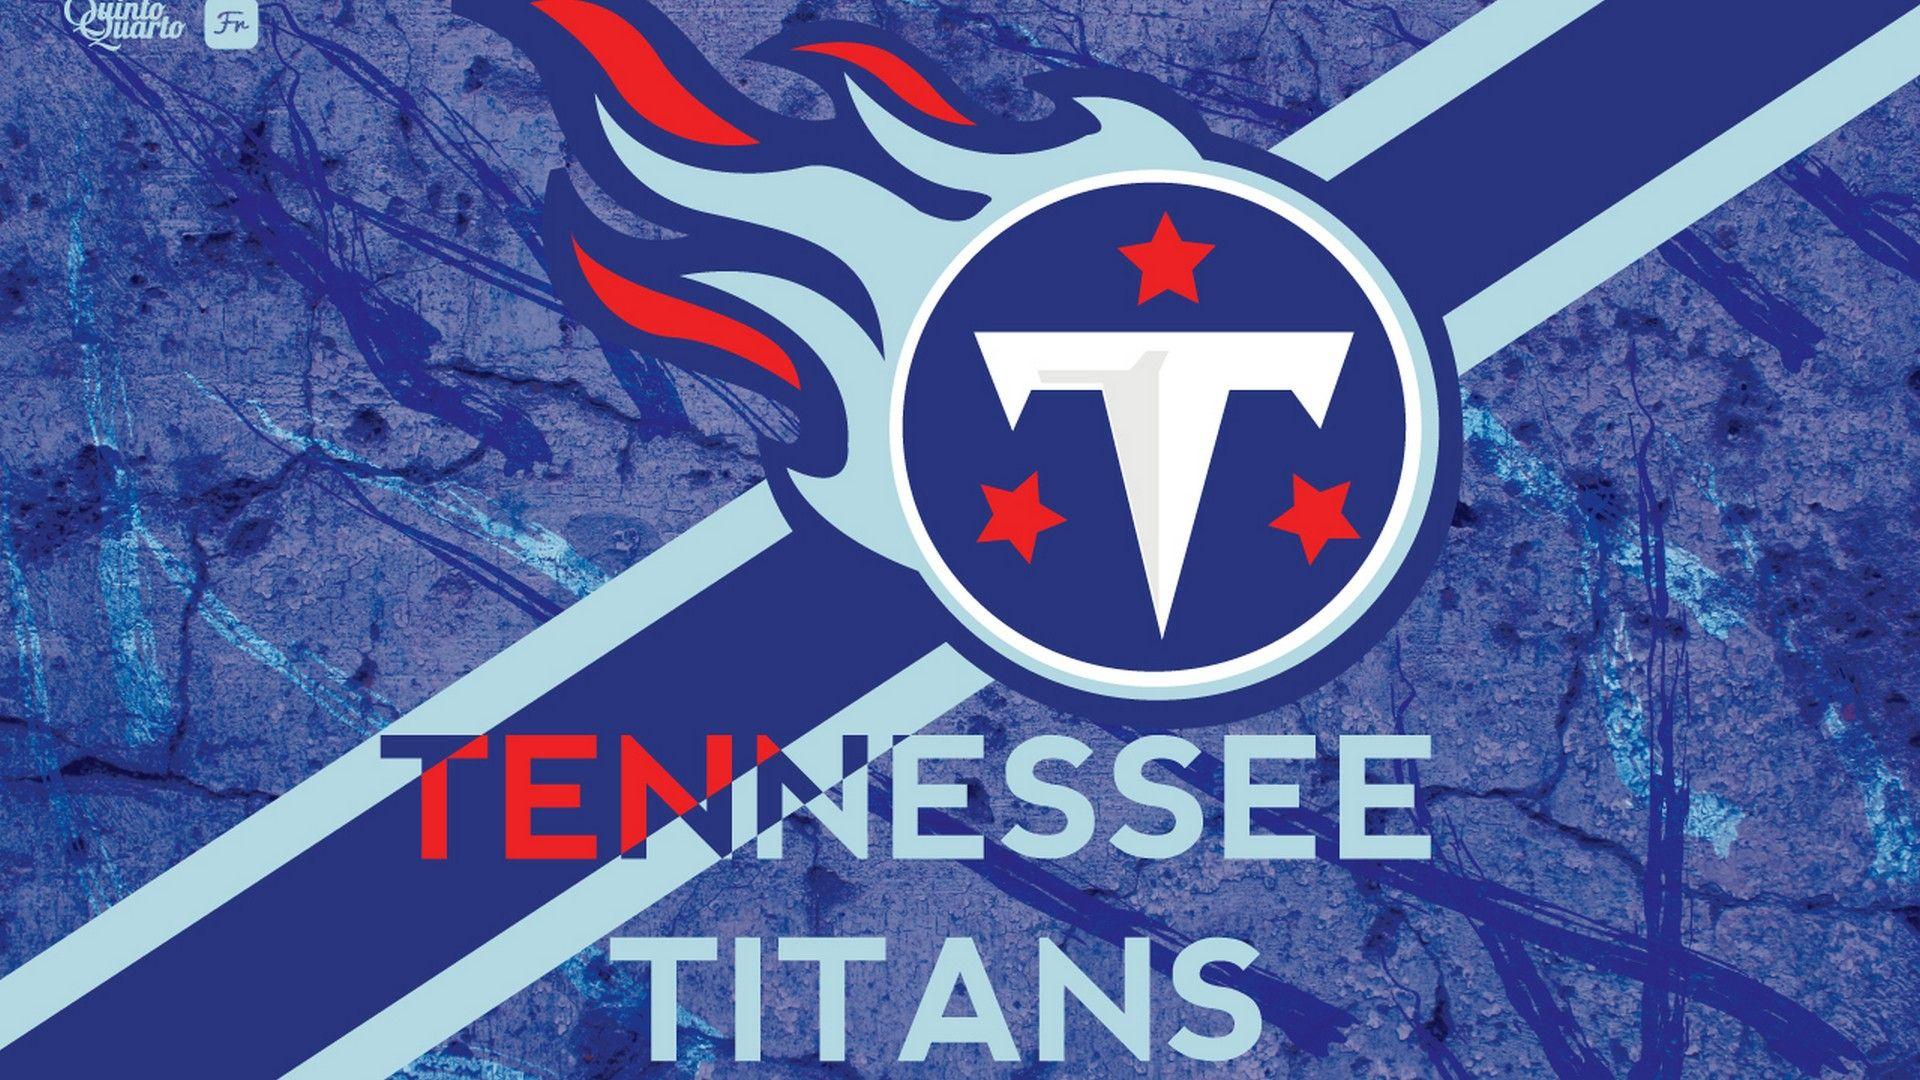 Wallpapers Hd Tennessee Titans 2020 Nfl Football Wallpapers Nfl Football Wallpaper Tennessee Titans Football Wallpaper